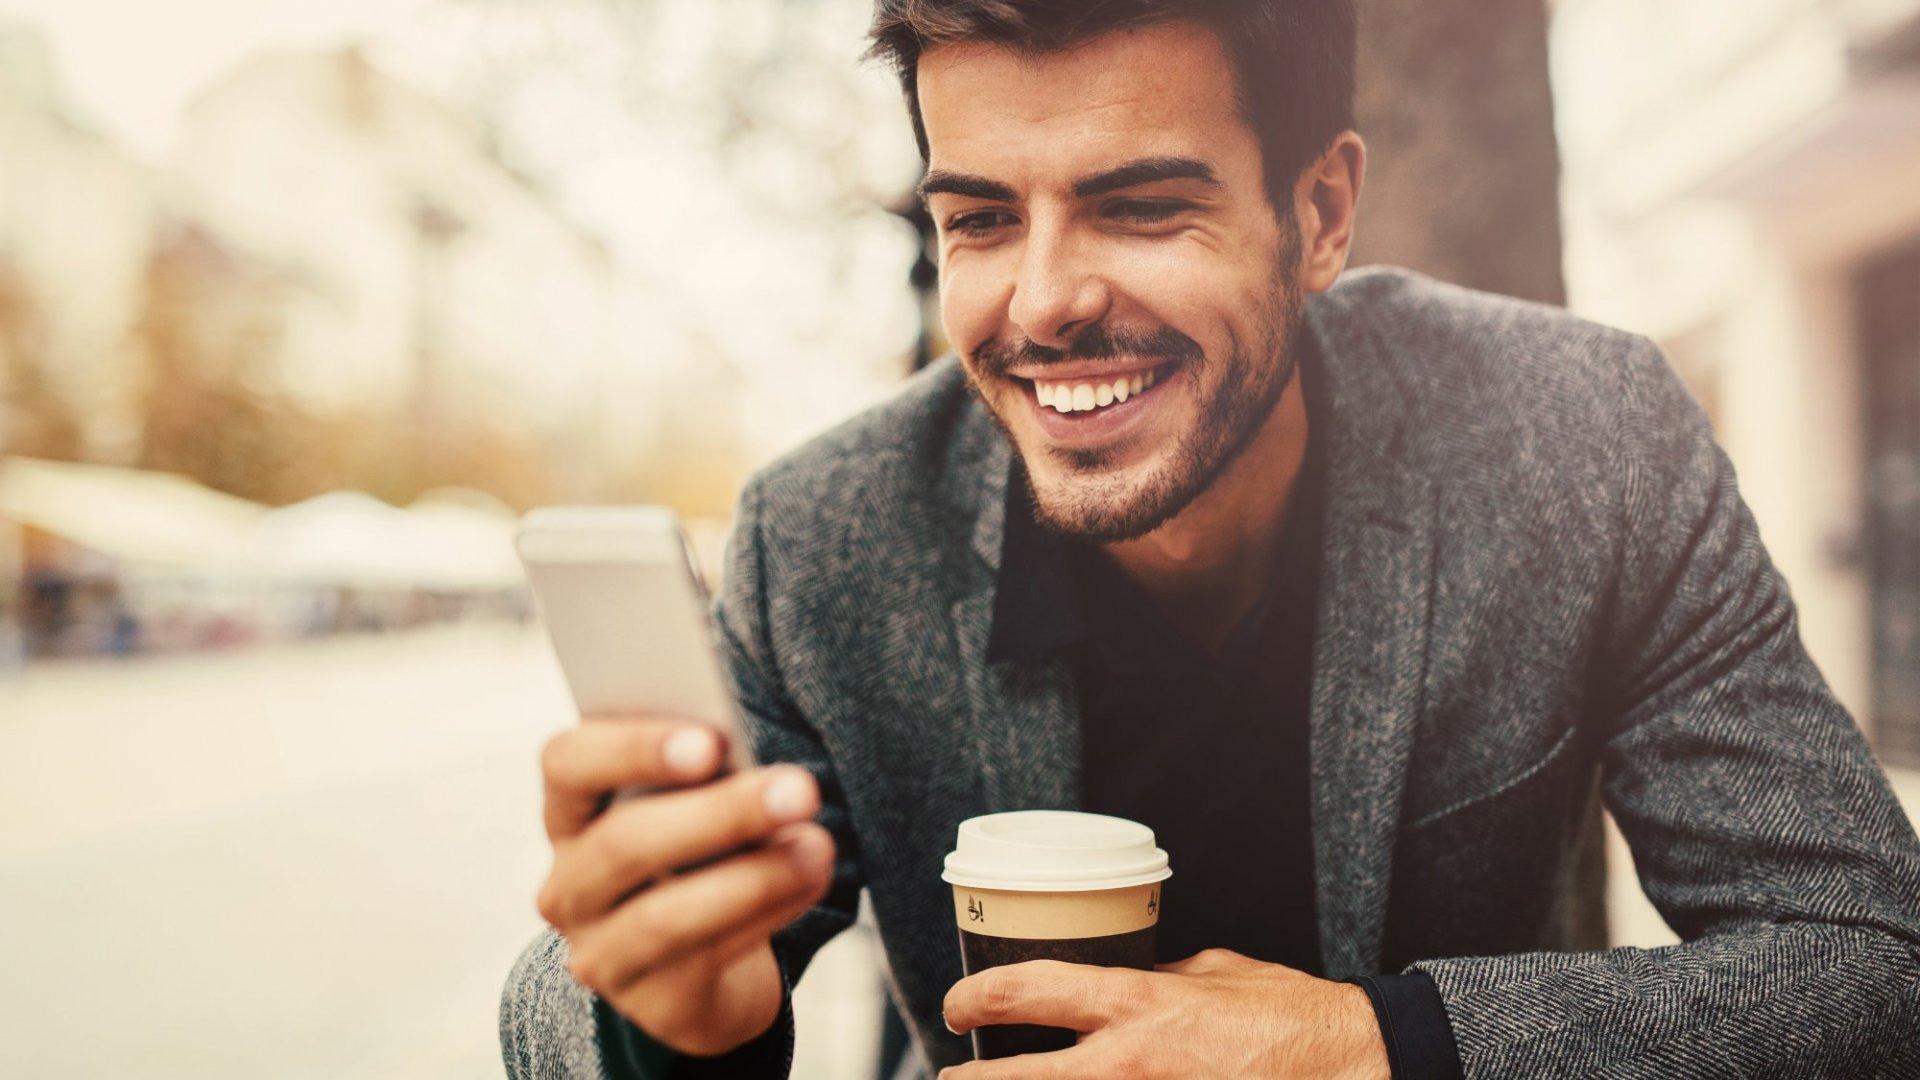 Why Millennials Make the Best Entrepreneurs